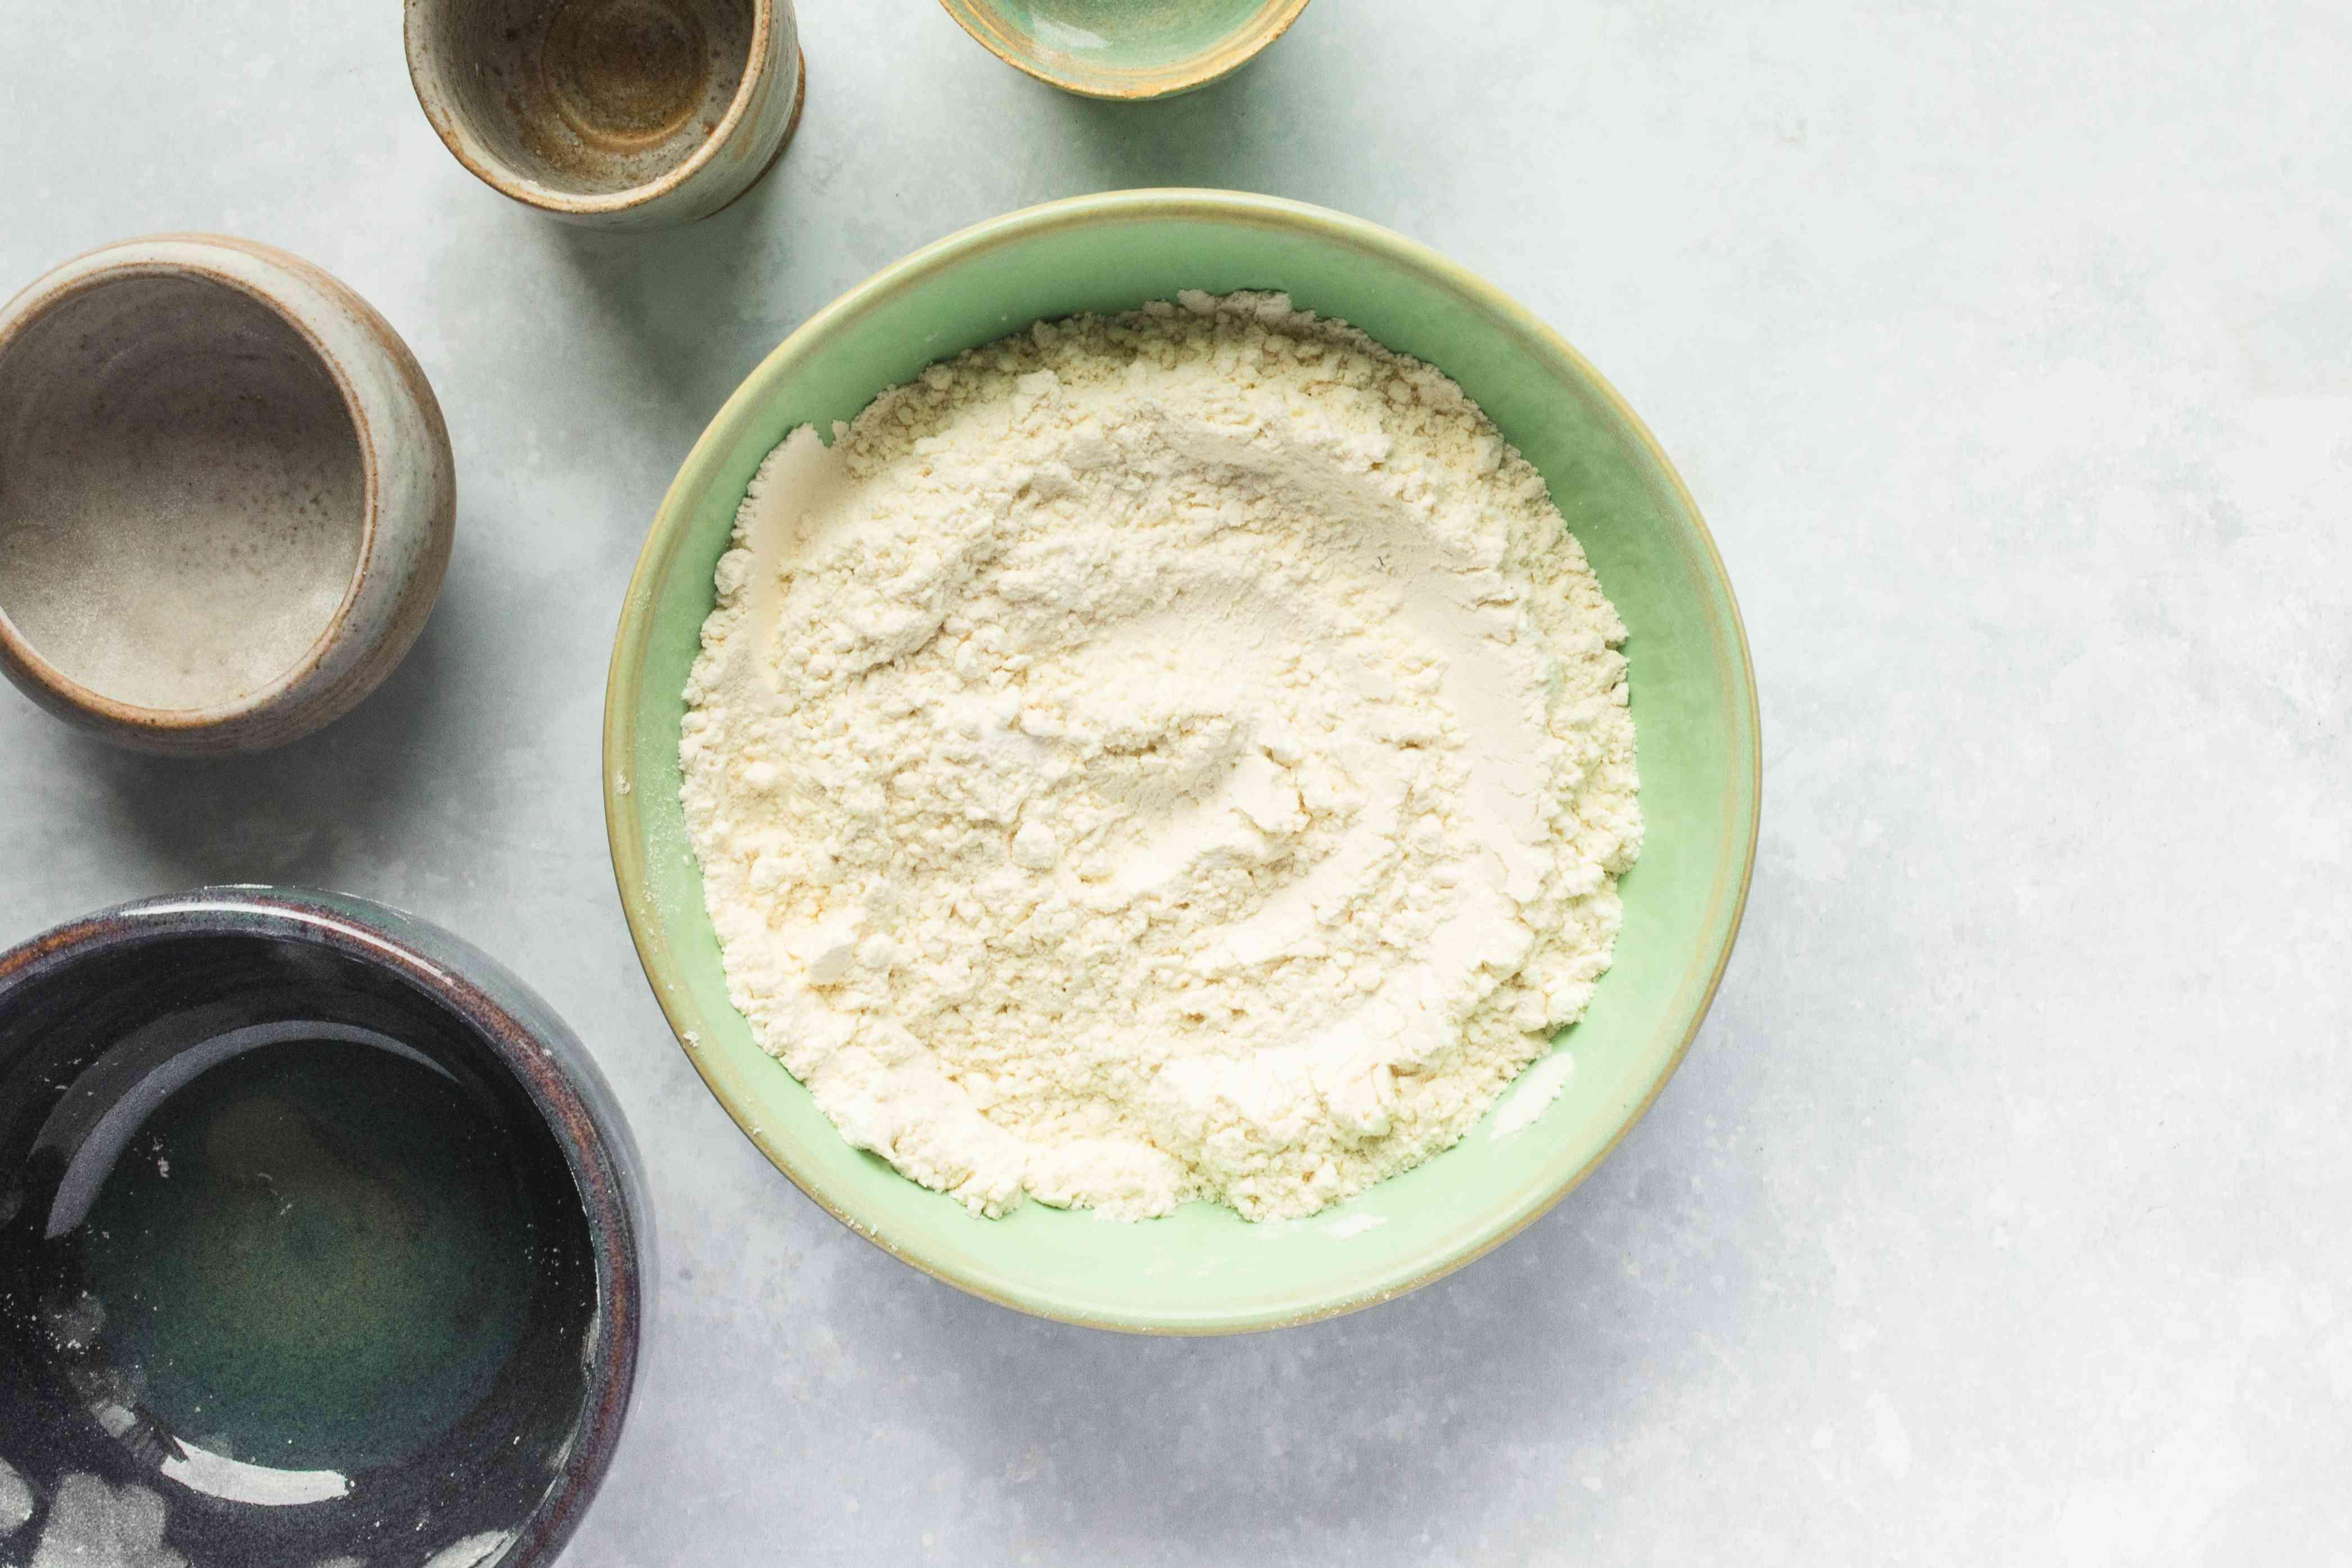 Combine flour